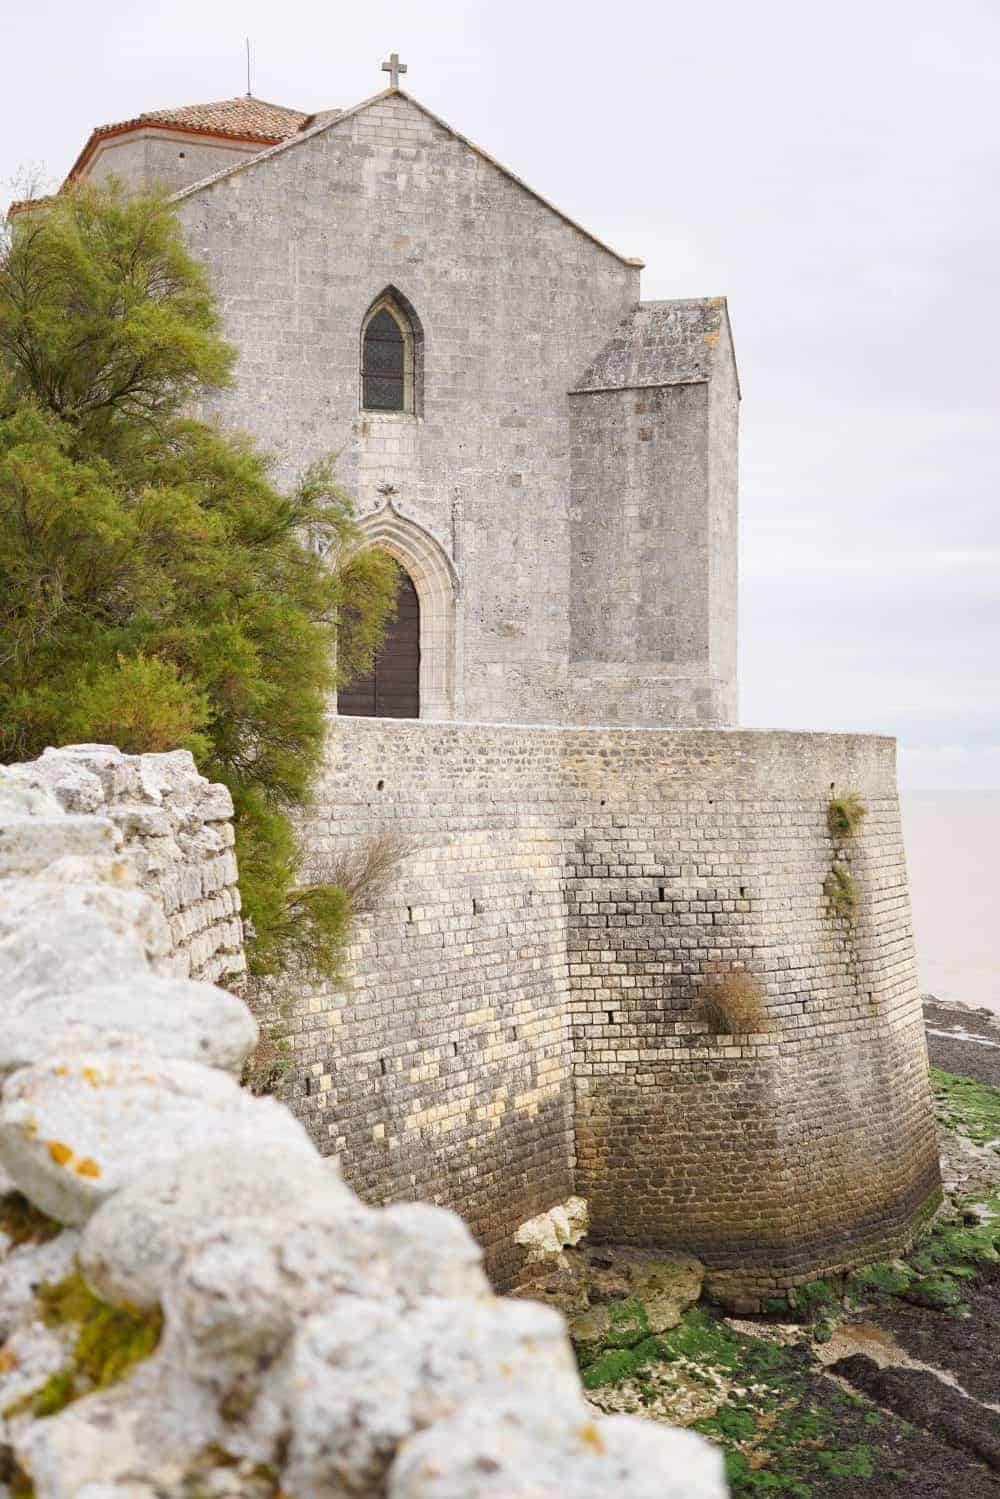 St Radegonde Church, Talmont-sur-Gironde